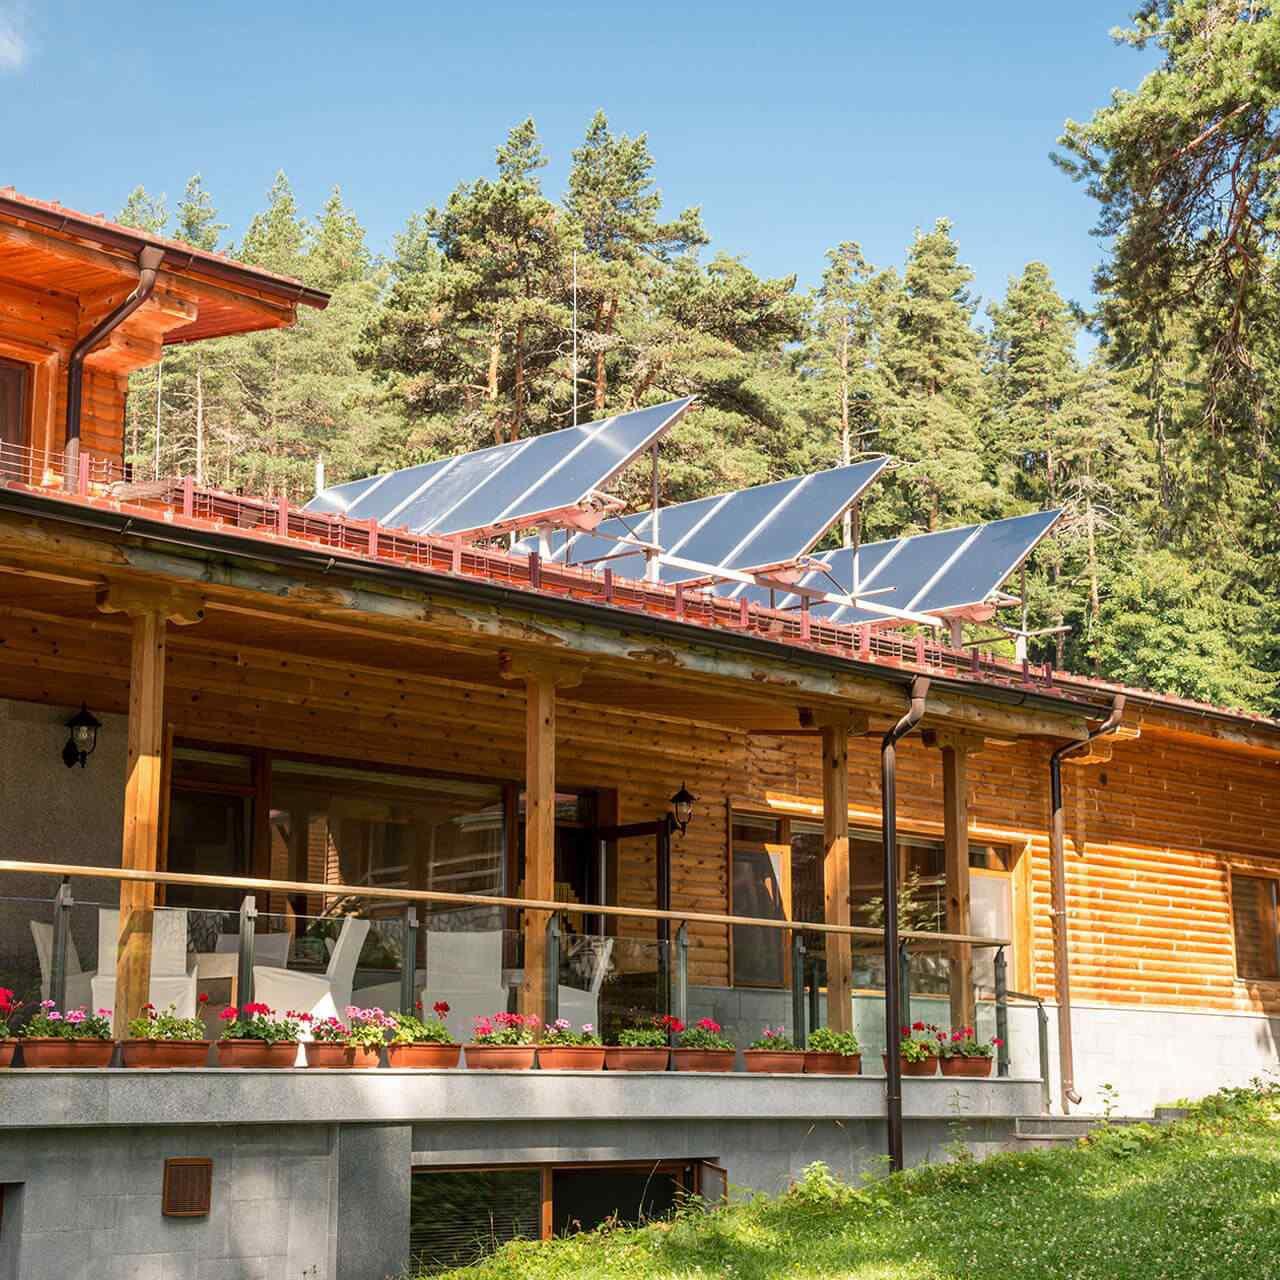 https://solarpanels-sanantonio.com/wp-content/uploads/2018/09/gallery_projects_11-1280x1280.jpg